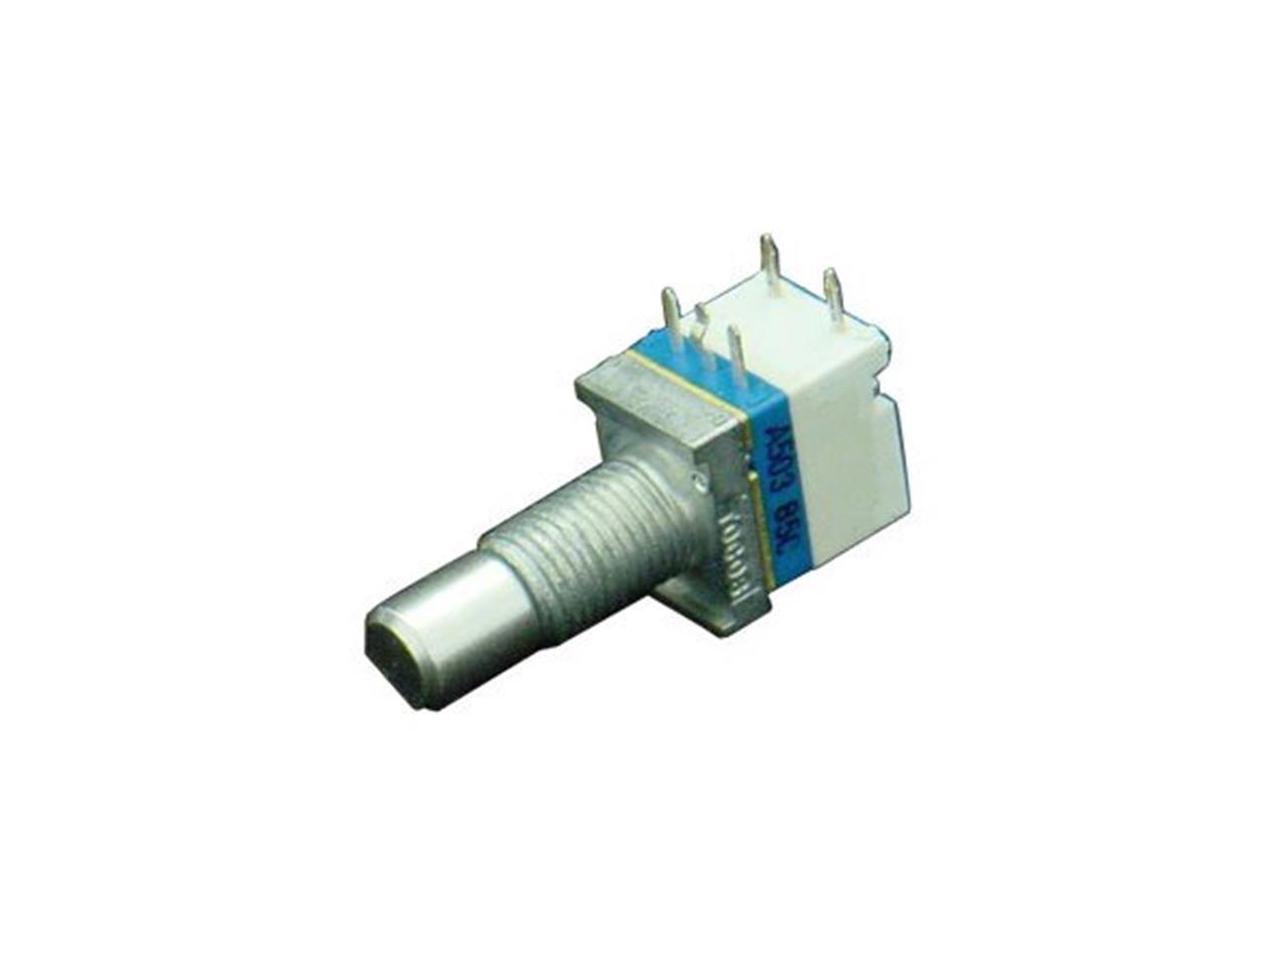 BRVG0924001 - Uniden Replacement Volume Switch (INNER) for ATLANTIS250 Radio